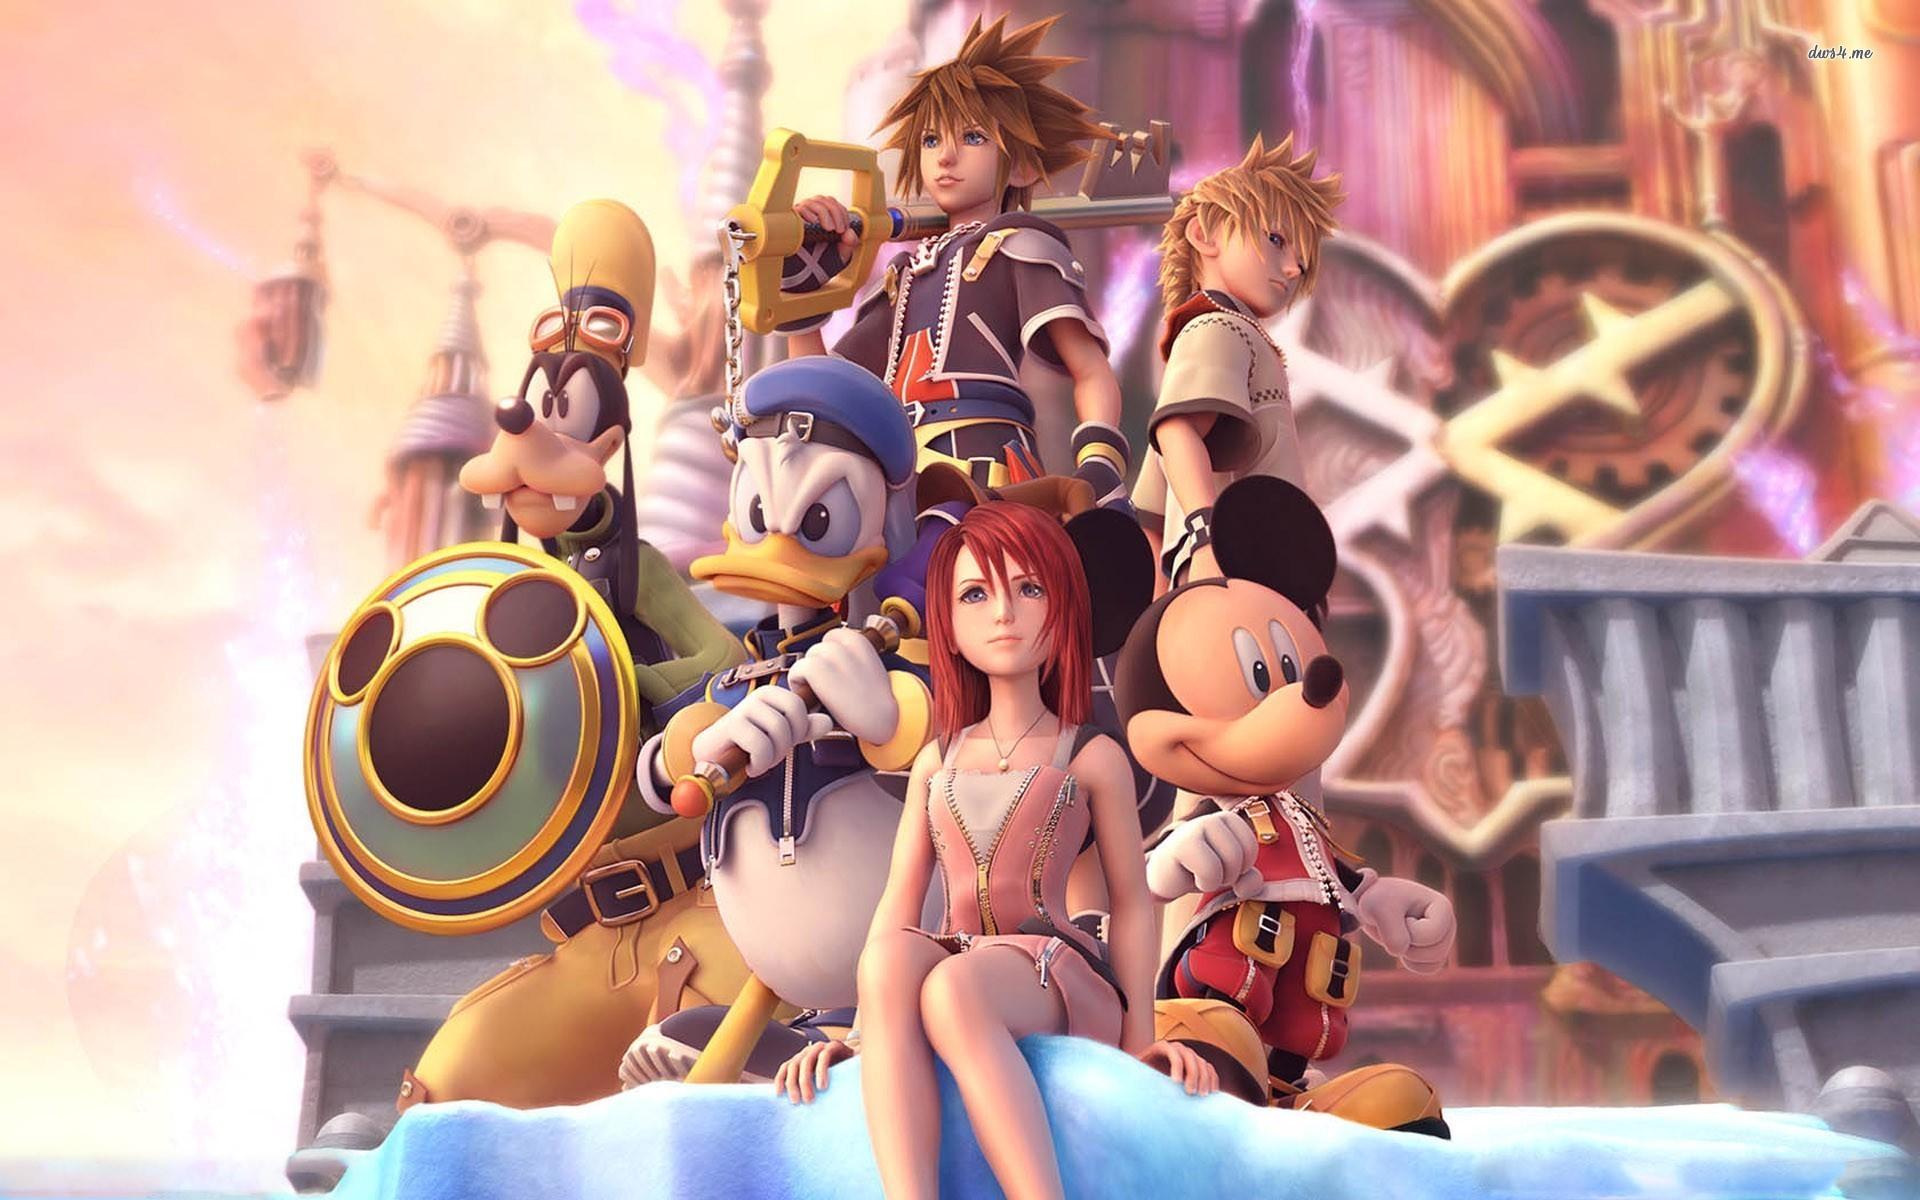 Kingdom Hearts wallpaper – Game wallpapers – #8515